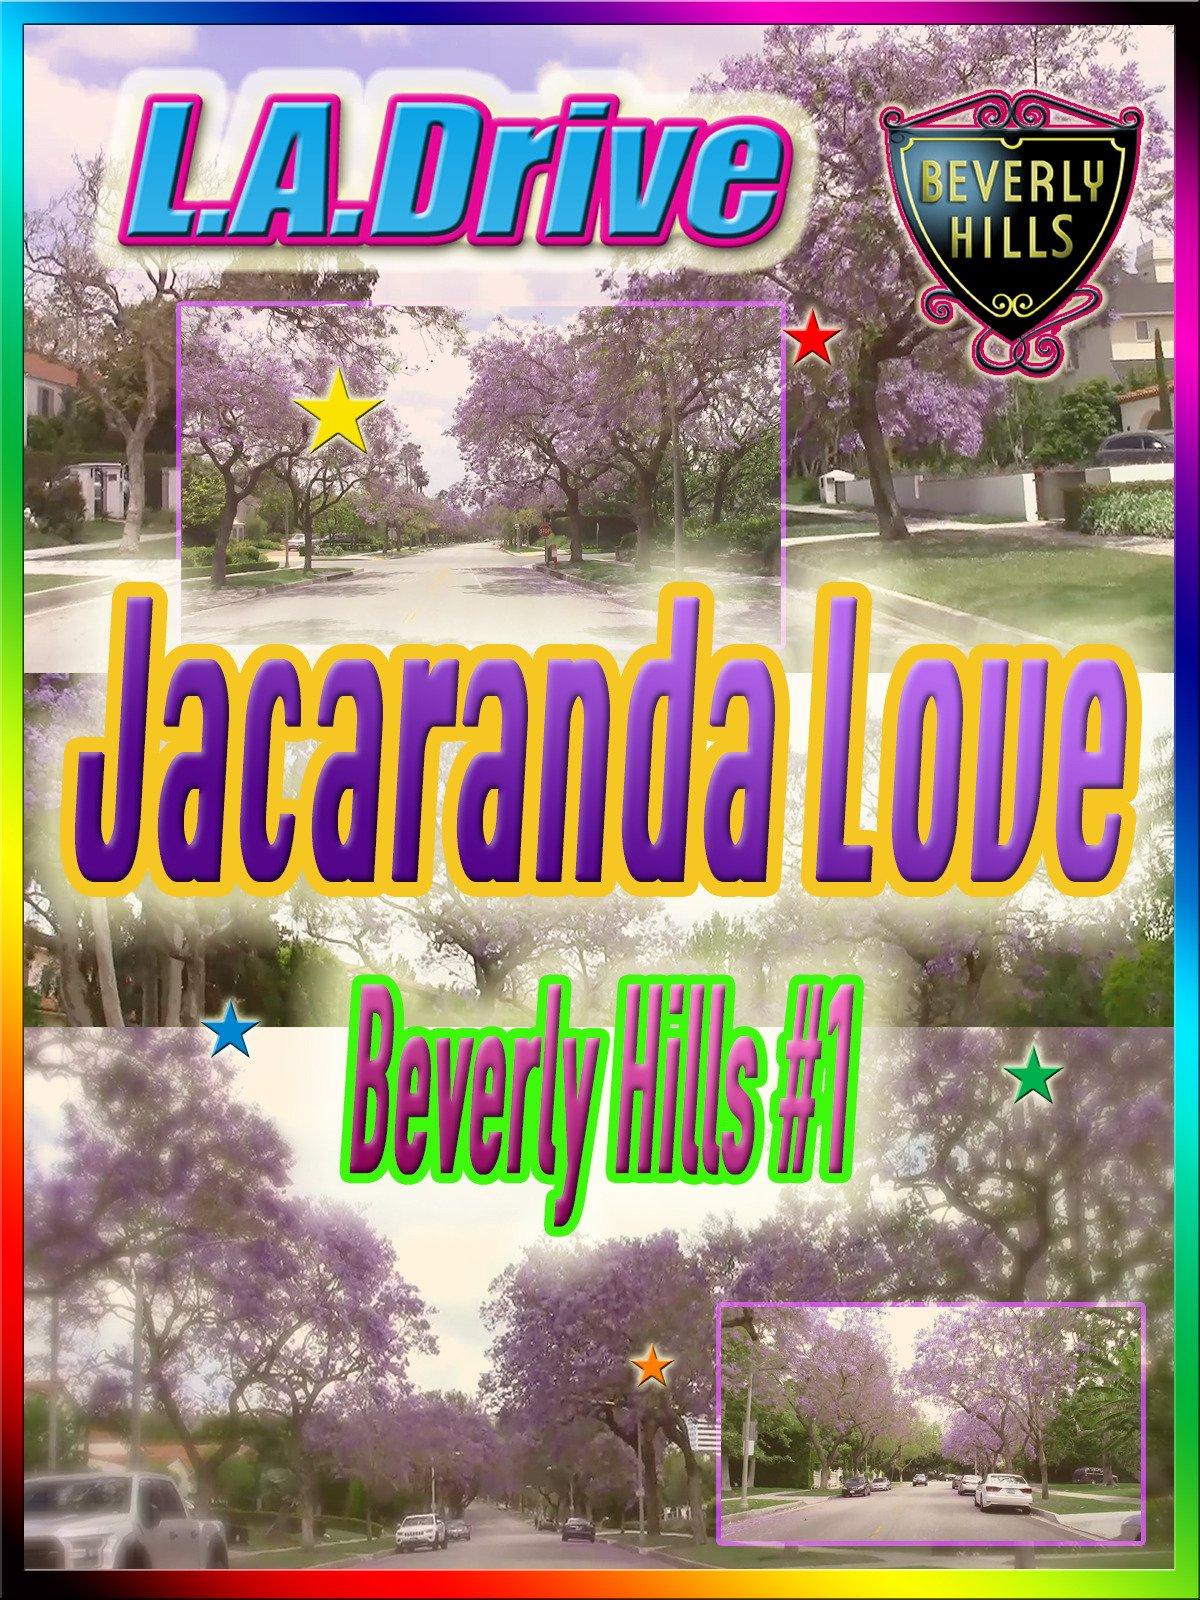 Clip: L.A. Drive Jacaranda Love Beverly Hills #1